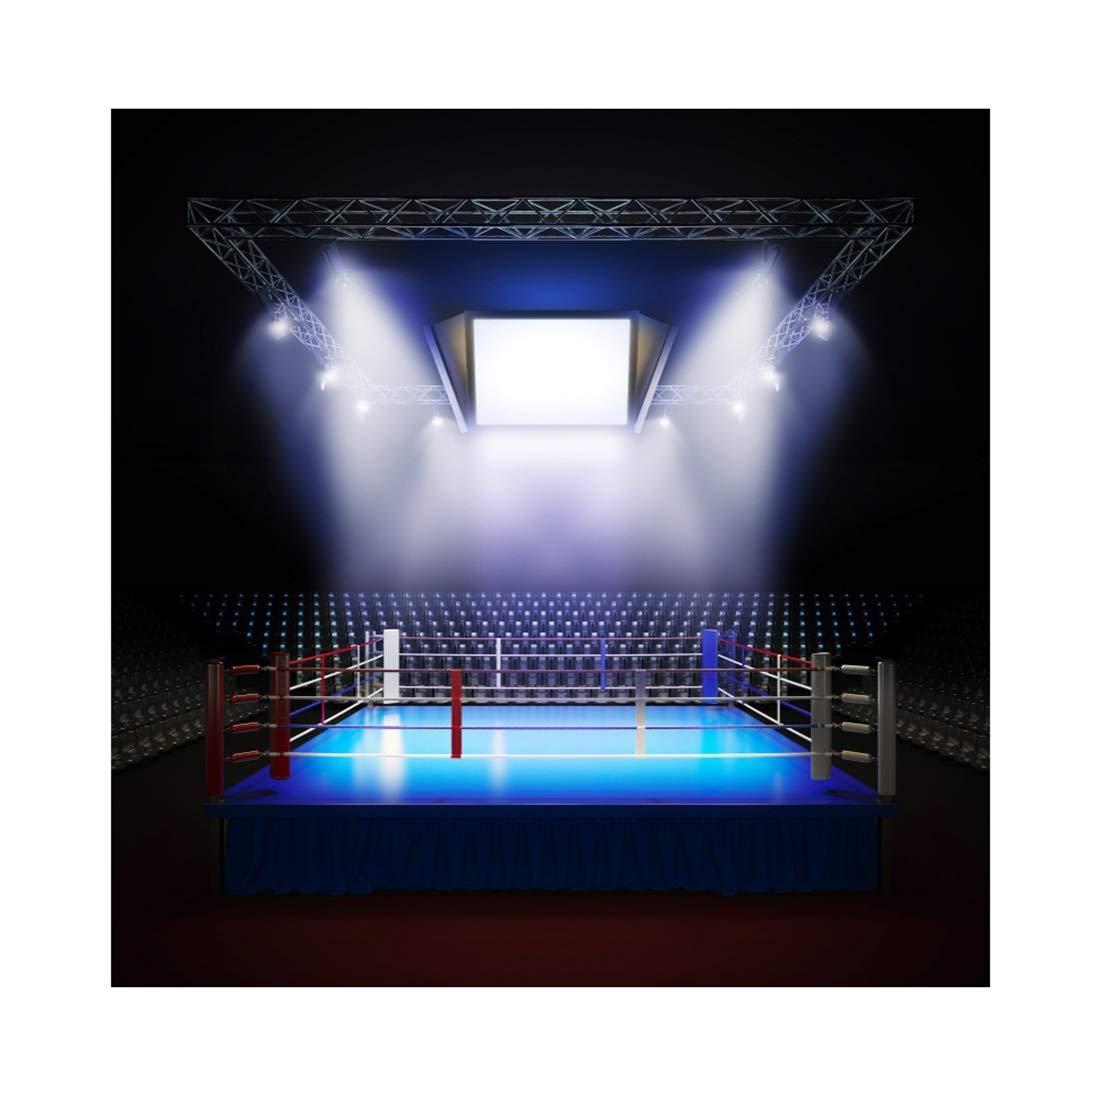 LFEEY 6 x 6フィート 空のプロ用ボクシングリング背景 写真撮影用照明 正方形 サークルプライズリング アリーナ背景 スポーツテーマ フォトブースフォトスタジオ小道具   B07F2MJJ75